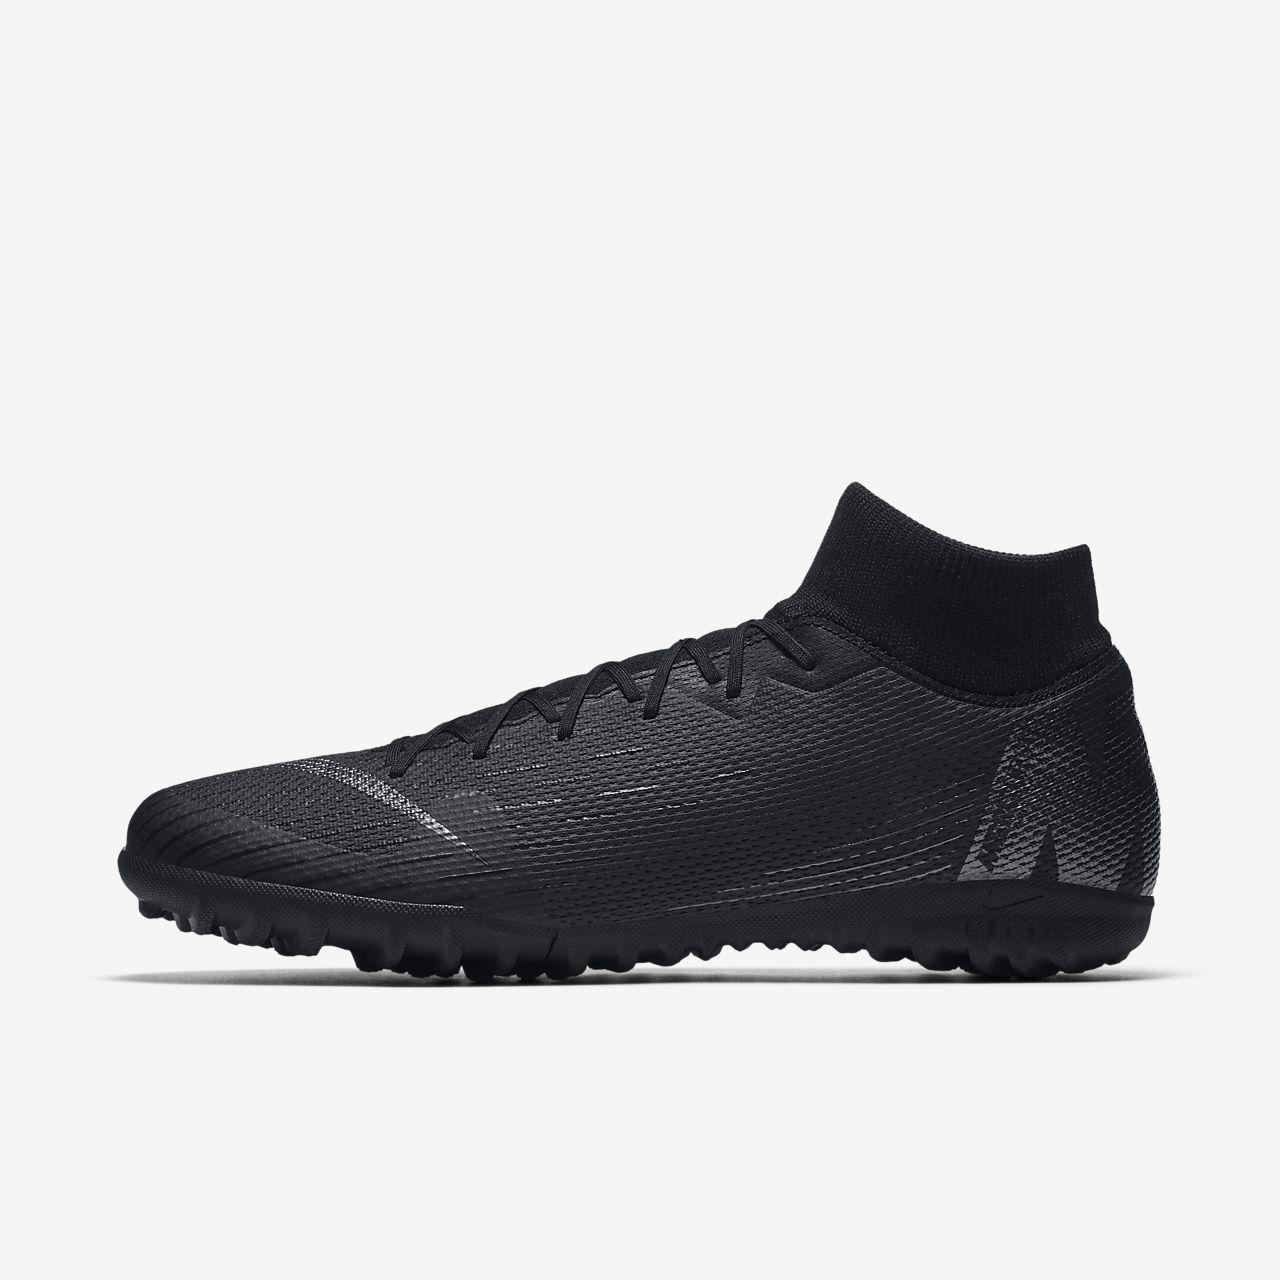 Pour Synthétique Nike Surface Mercurialx Chaussure De Football XwqtTtnEI 4a58b5195706e